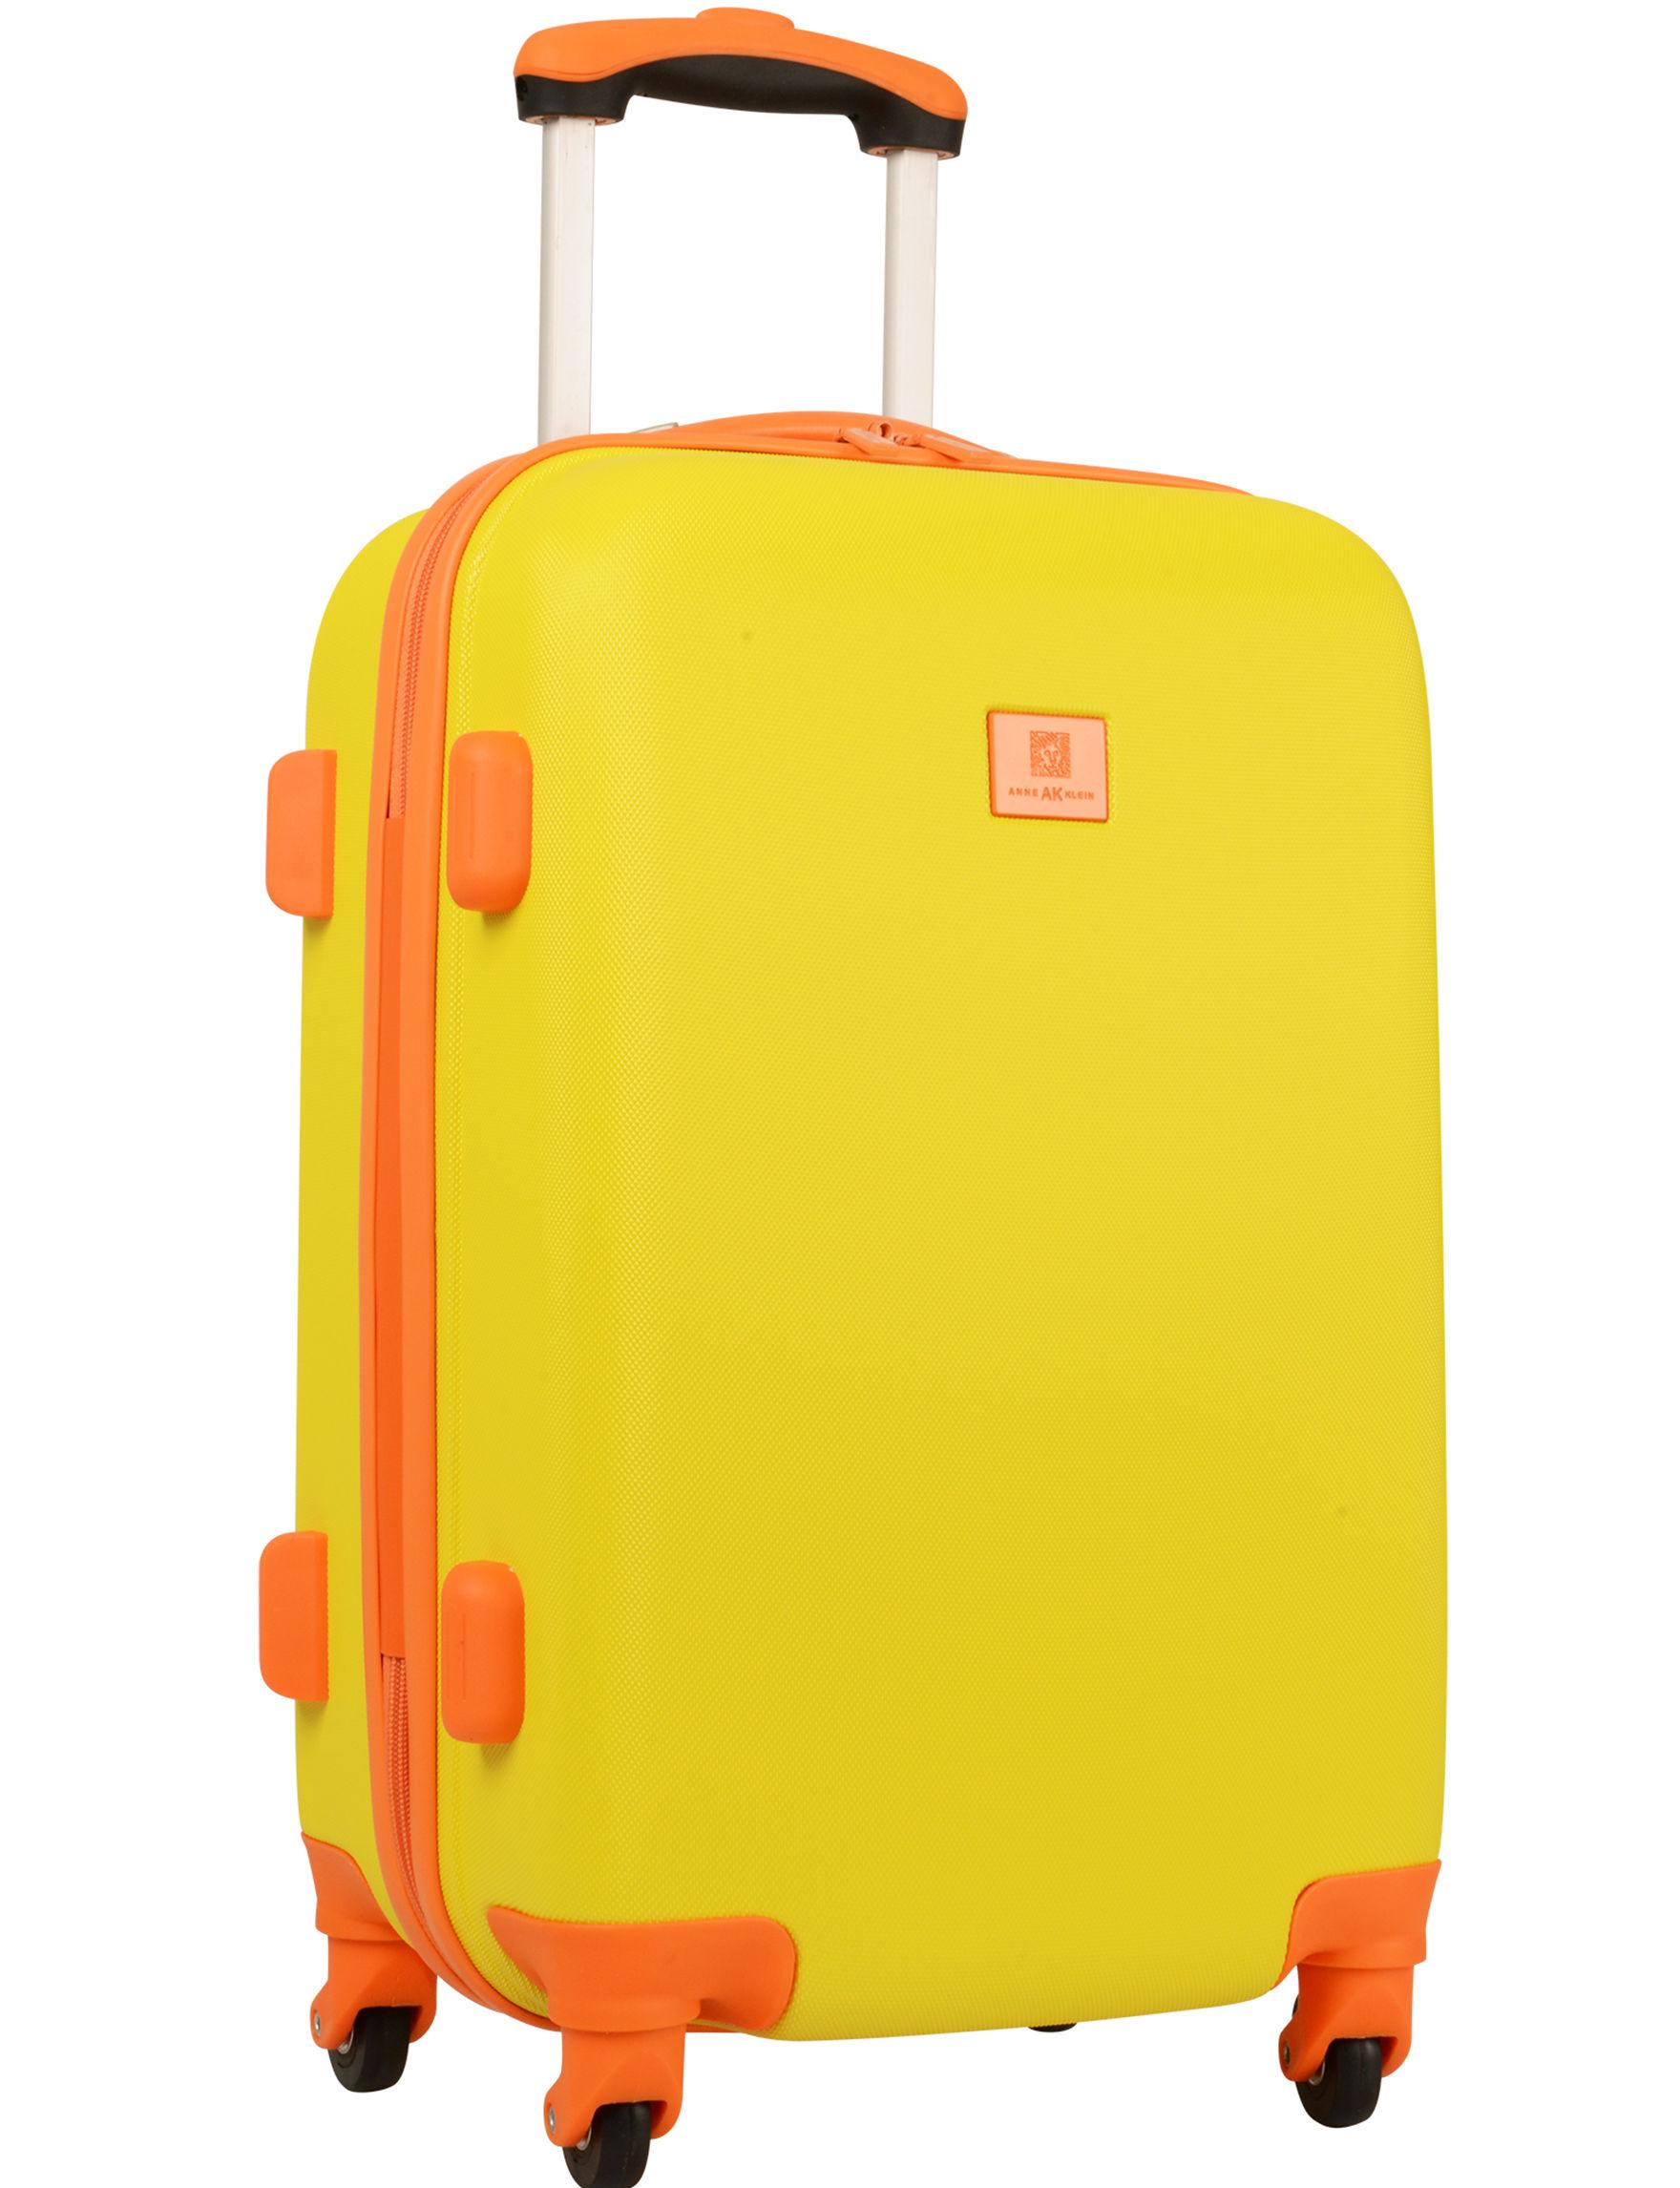 Anne Klein Yellow / Orange Upright Spinners